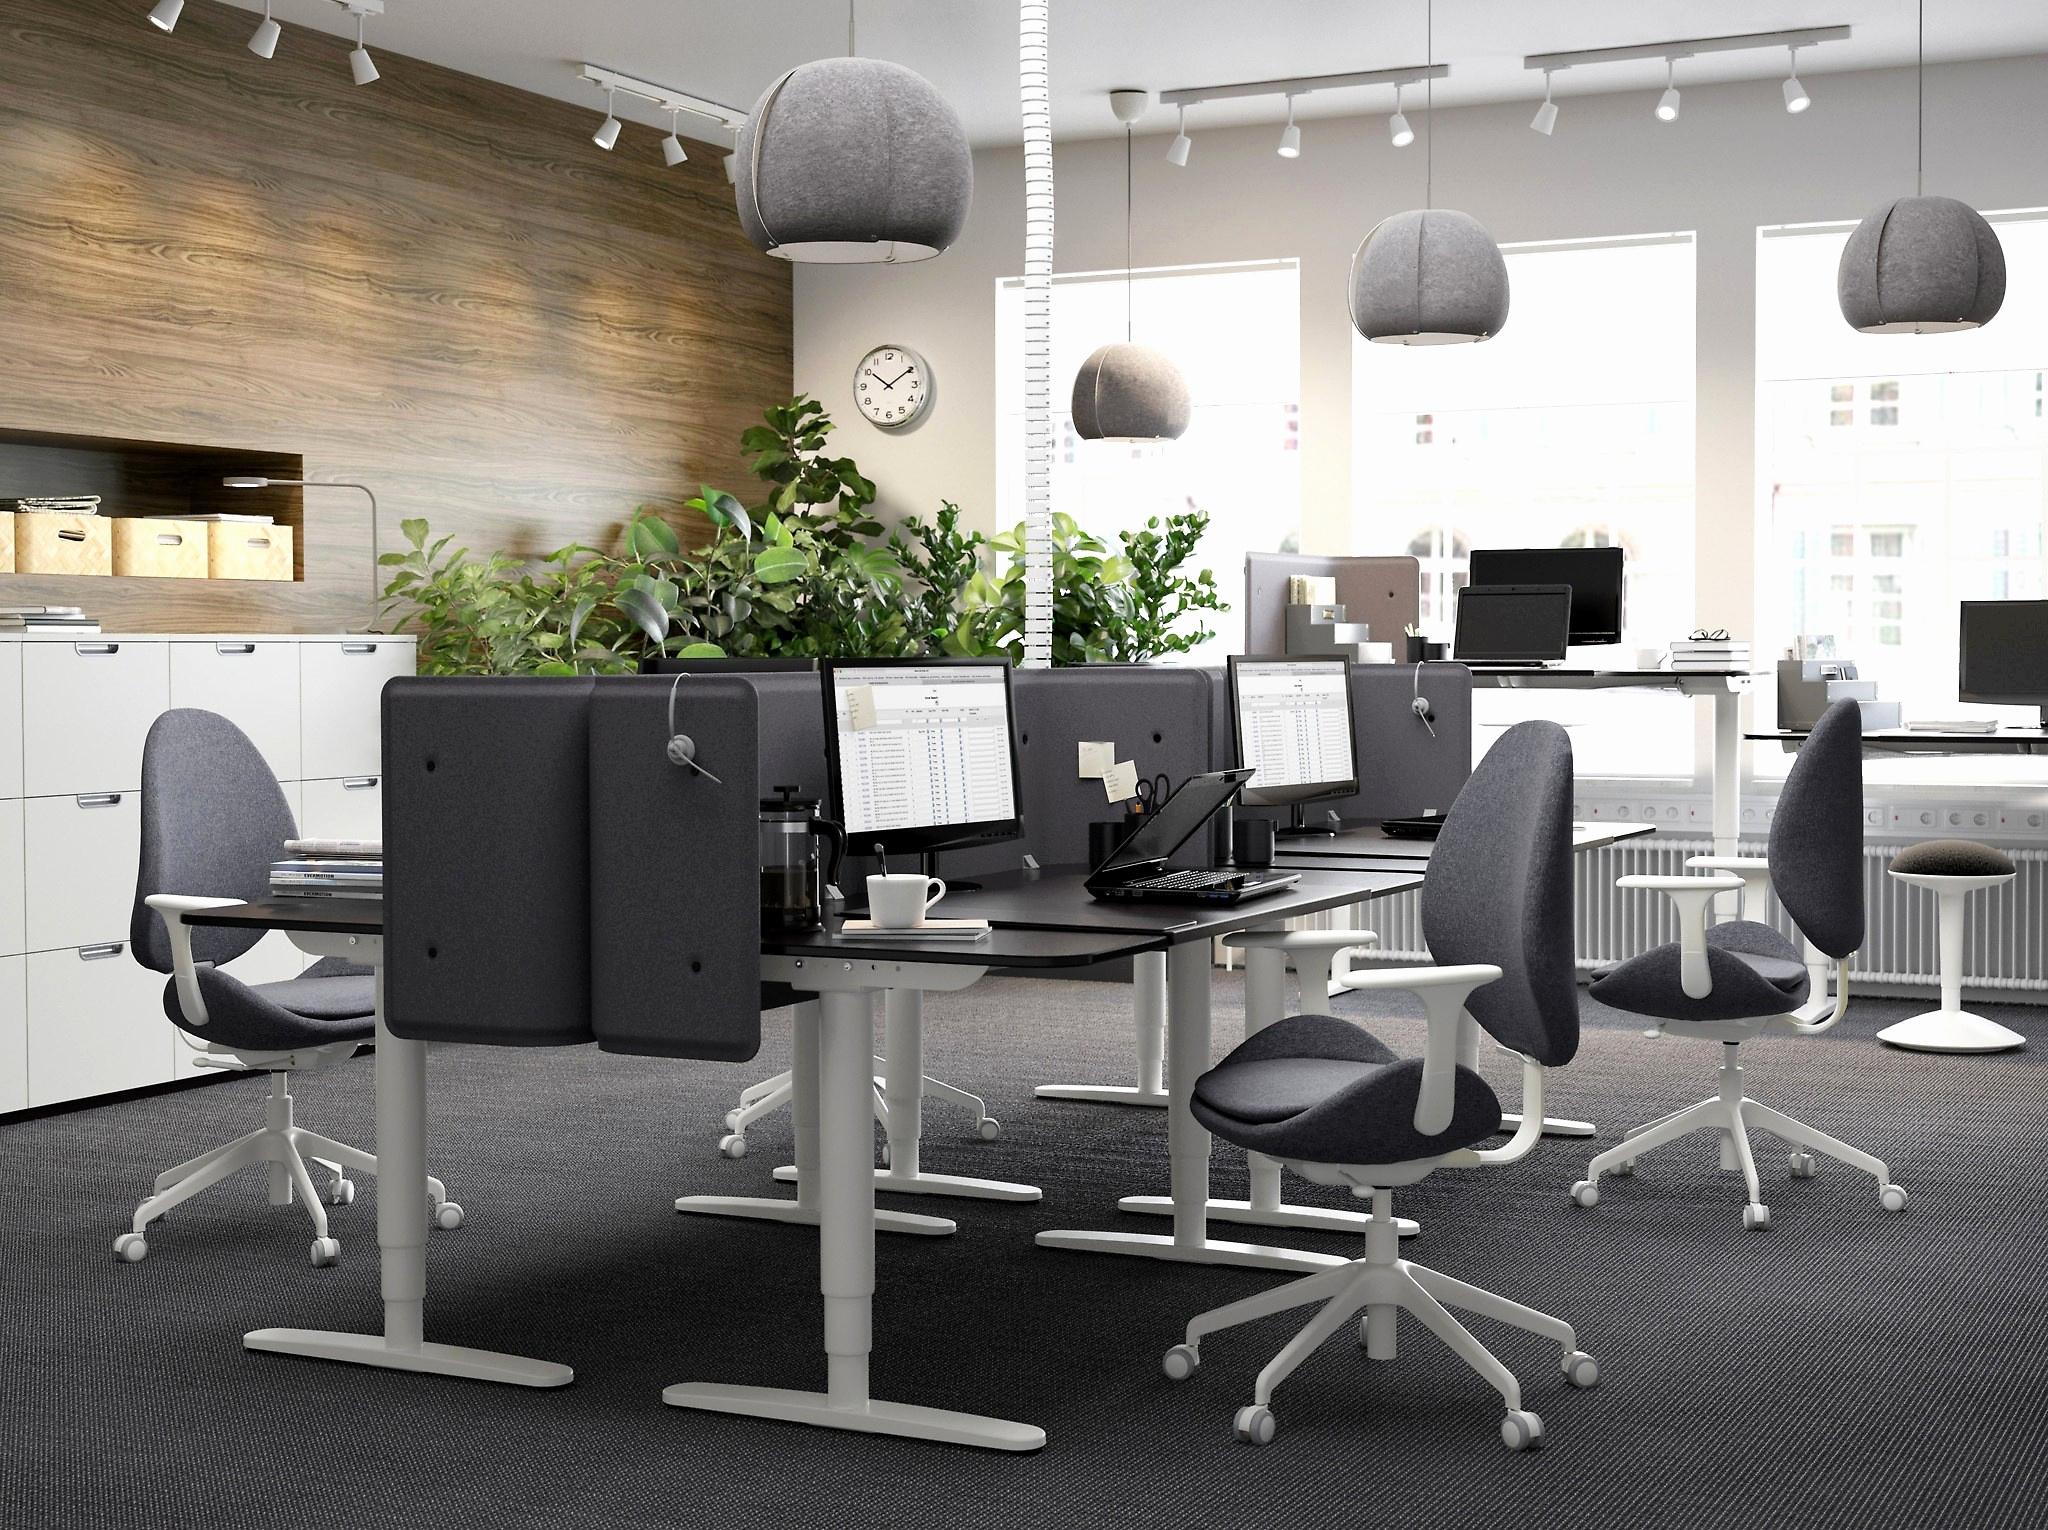 tabouret haut design elegant chaise bar bois tabouret de bar exterieur beau bar exterieur 0d of tabouret haut design